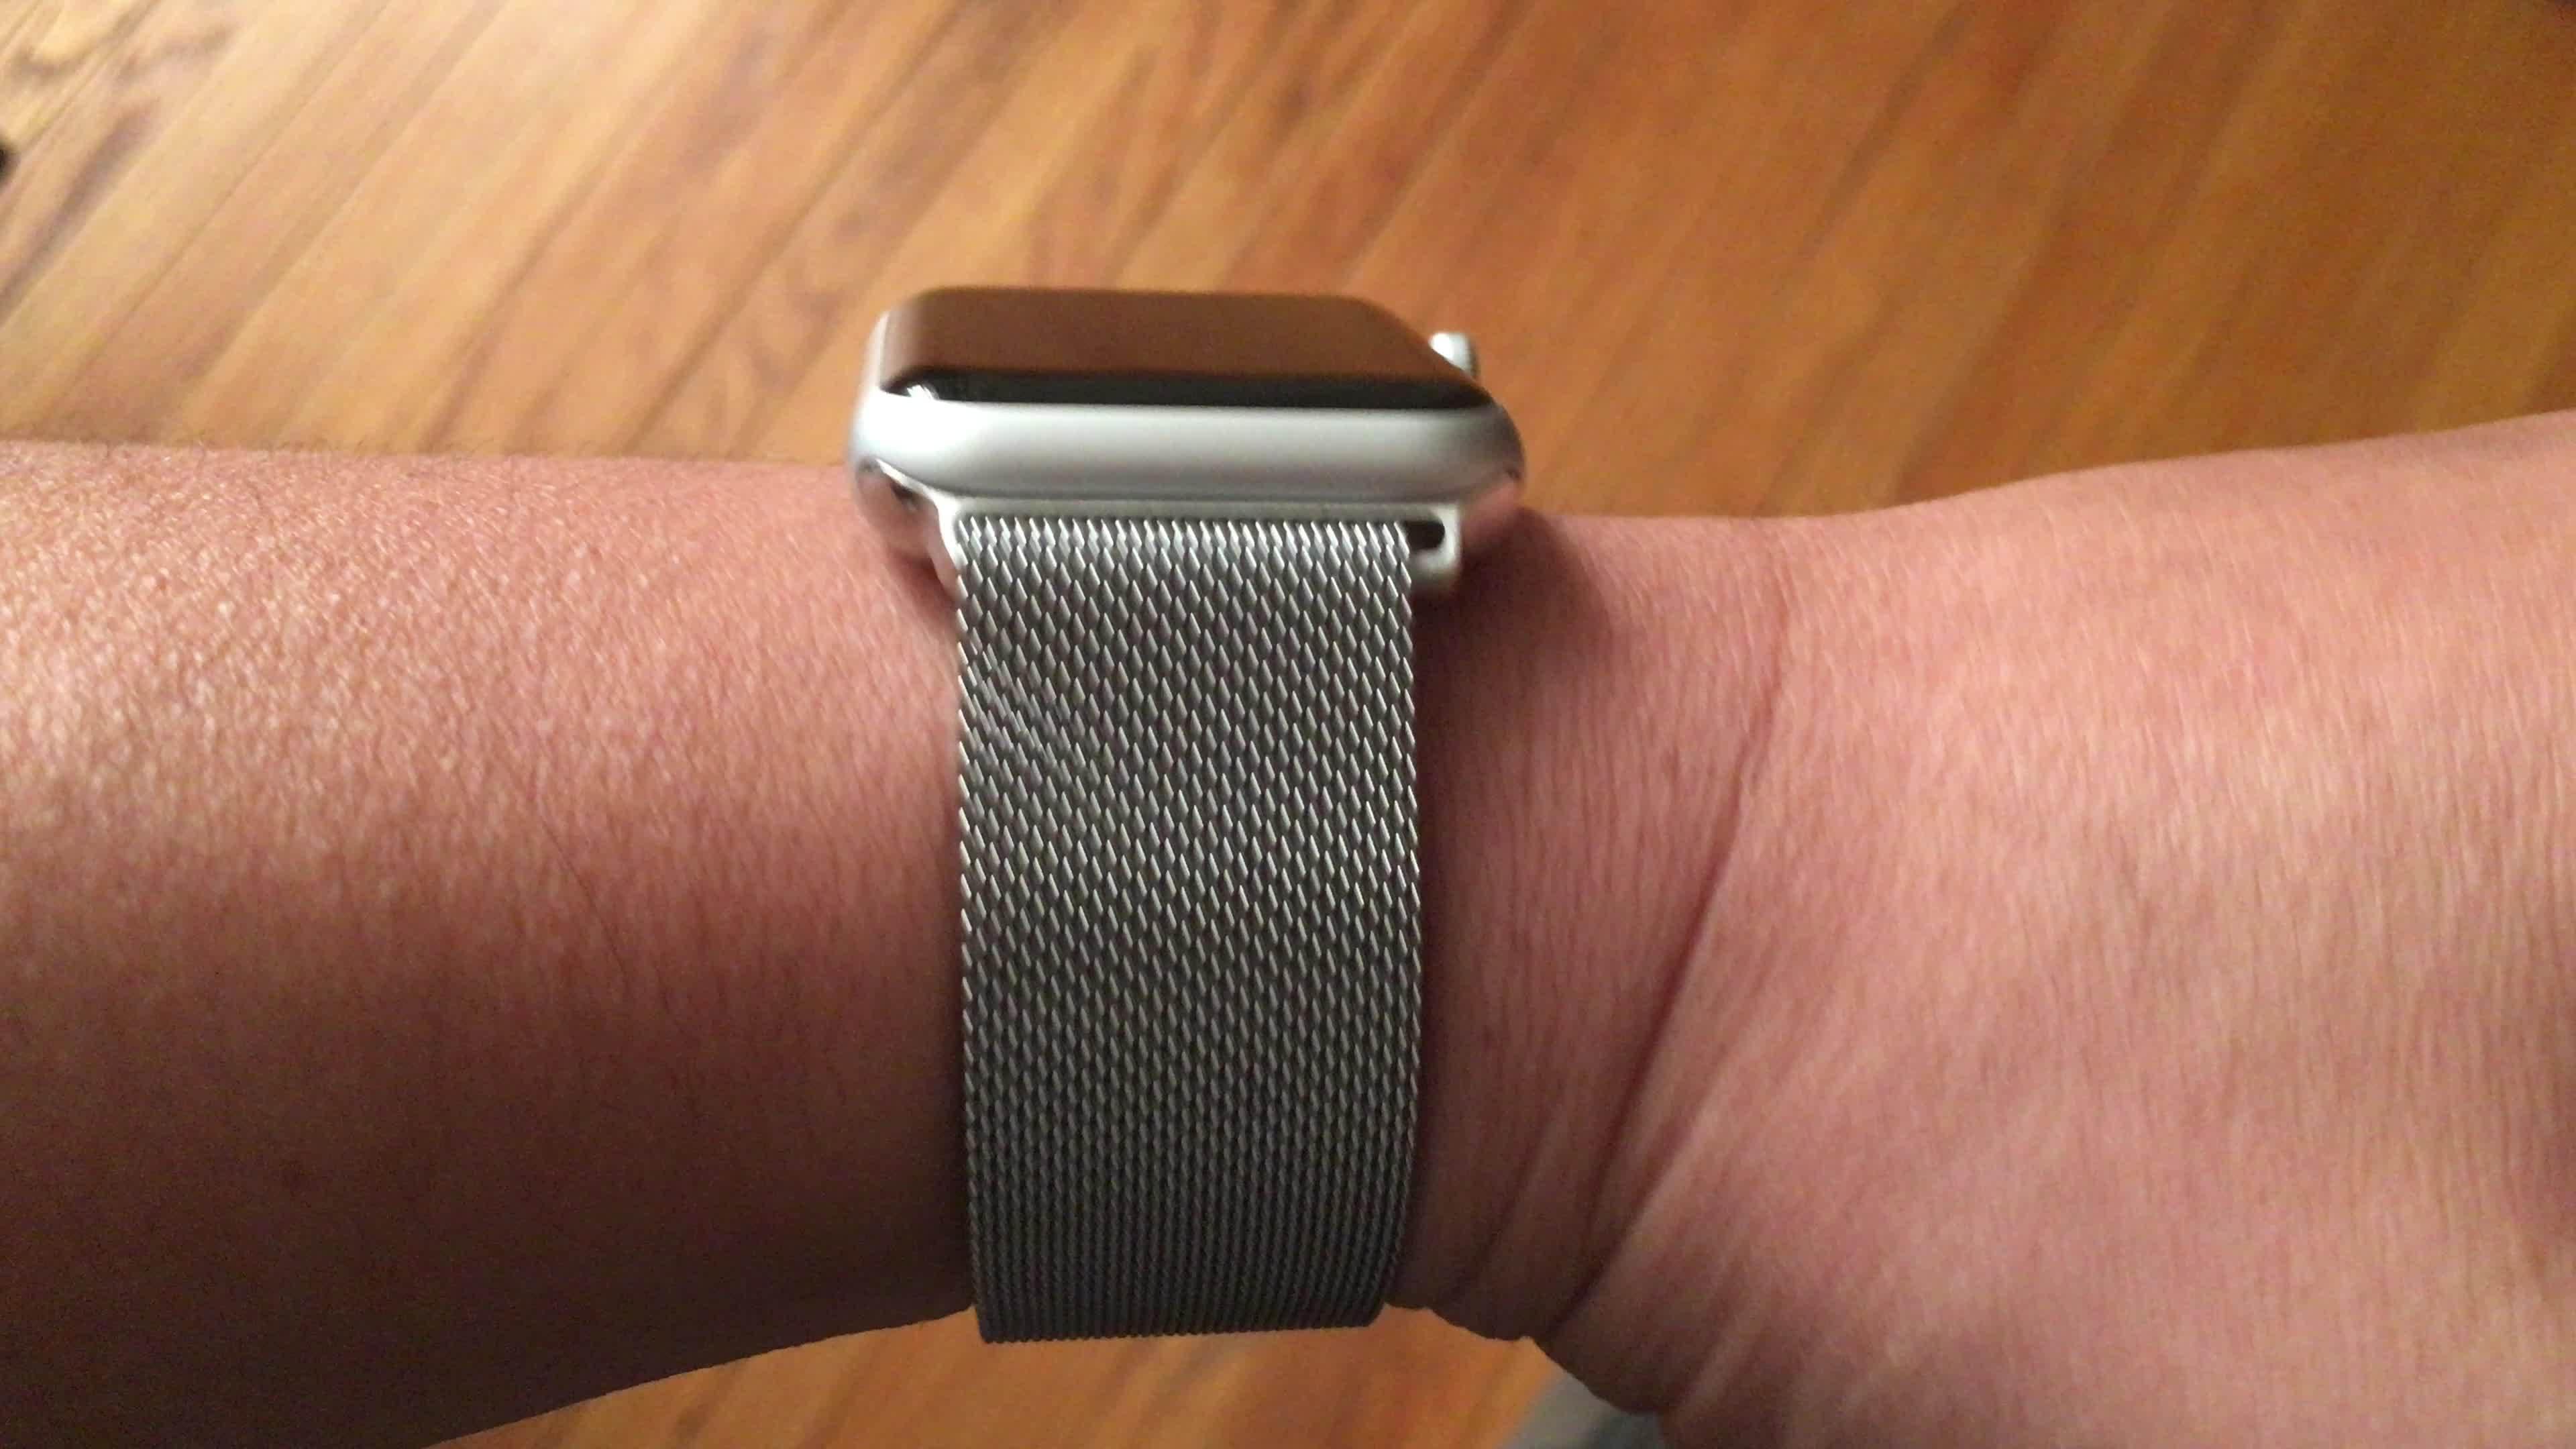 apple watch, applewatch, dezign999, Dezign999 Steam B. Willie for Apple Watch GIFs